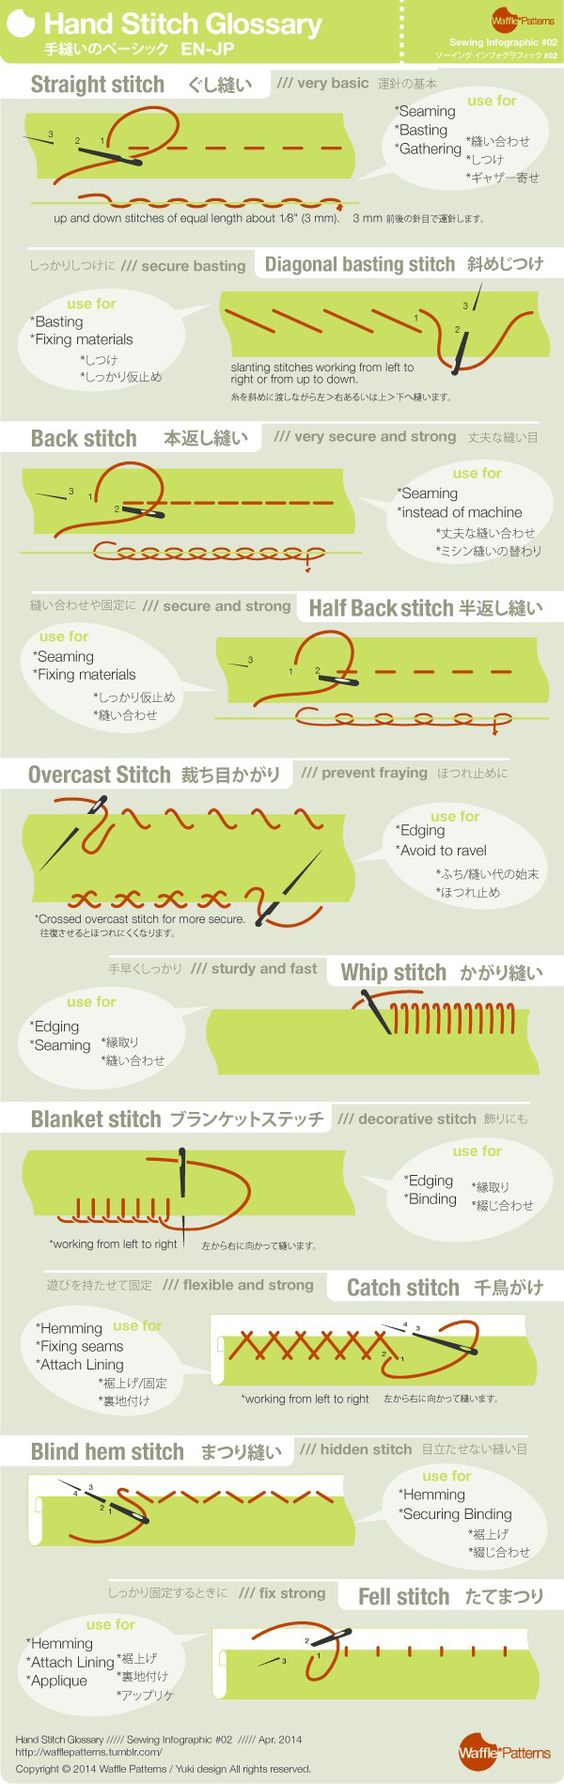 Stitch Glossary